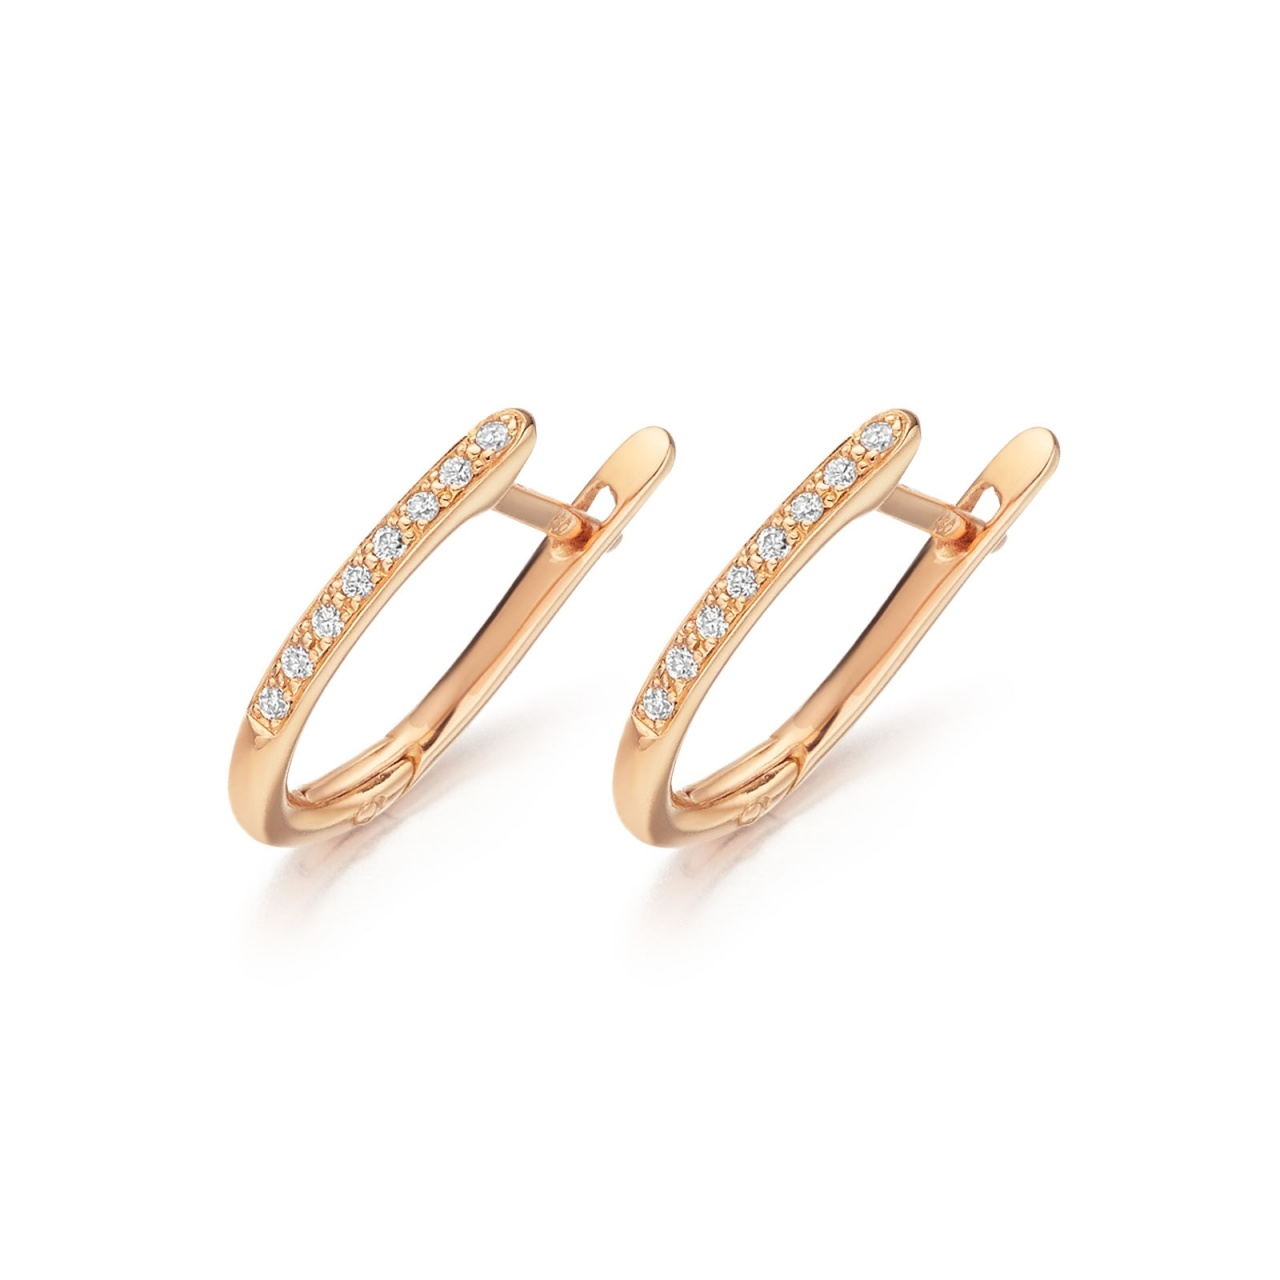 Rose Gold Diamond Leverbacks with Mythologie Red Garnet Drops-EARGRG1315-1